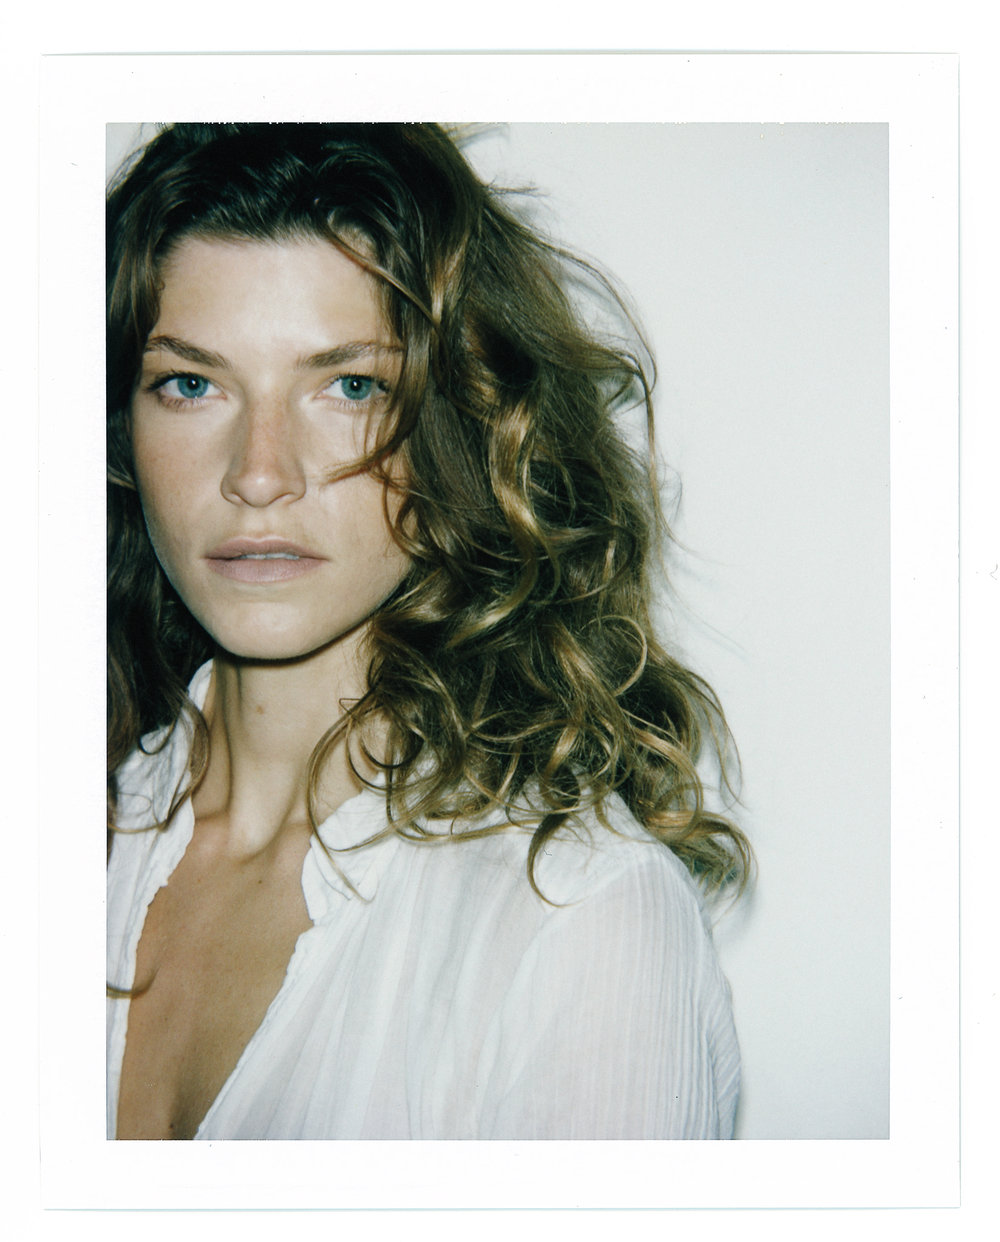 nick_sabatalo_photography_fashion_photographer_los_angeles_new_york